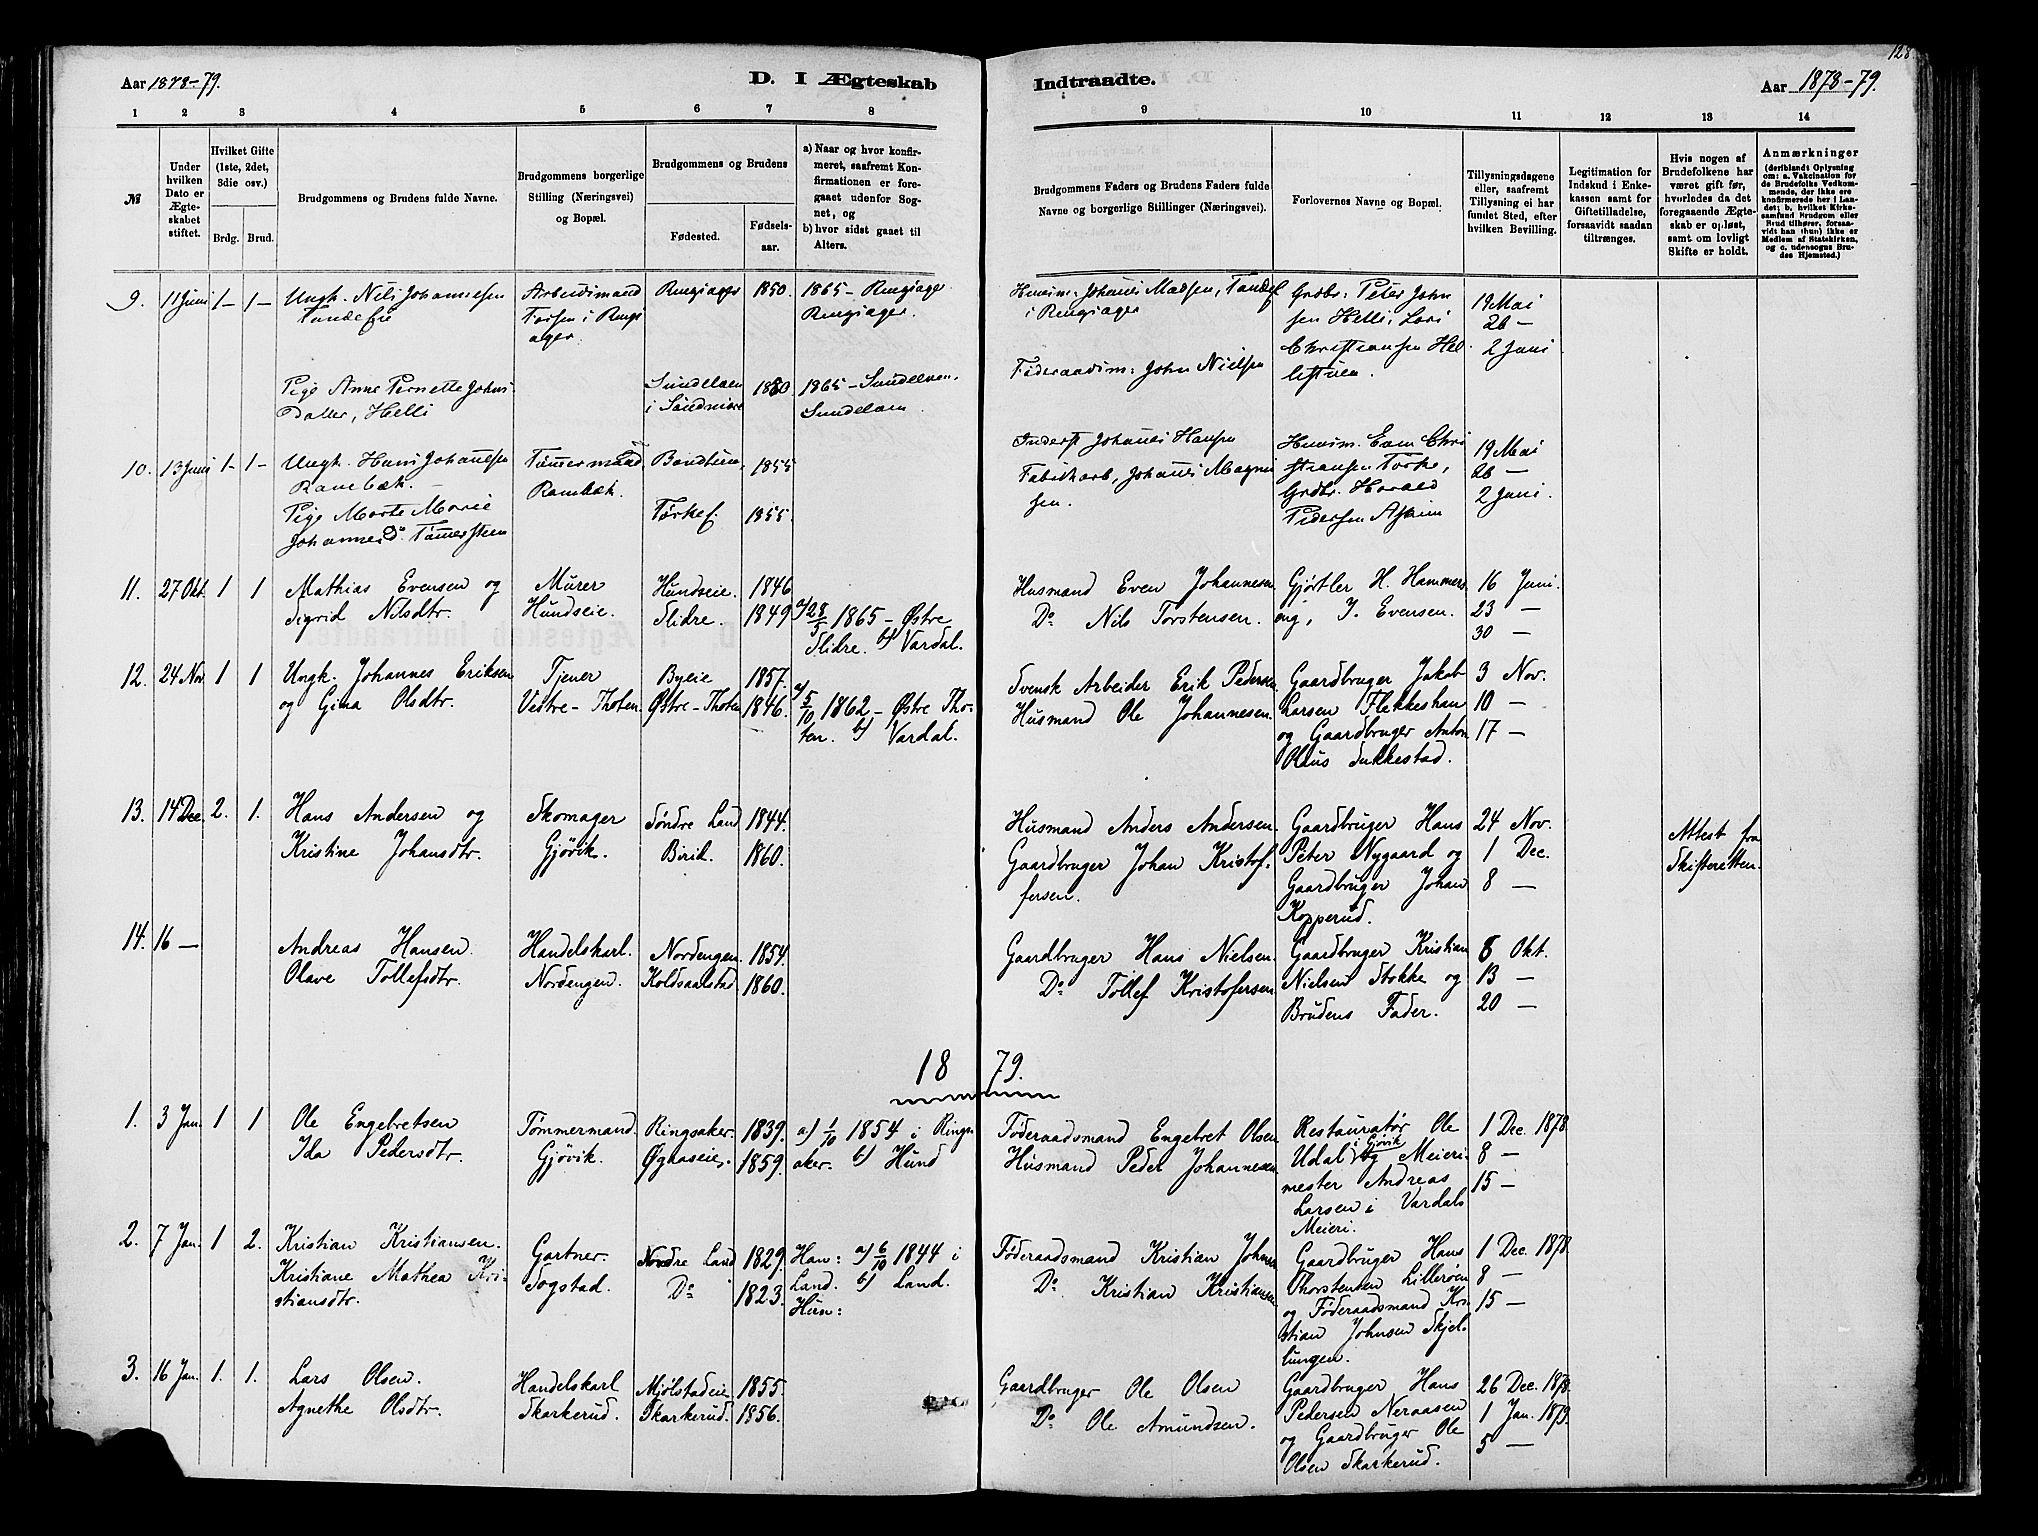 SAH, Vardal prestekontor, H/Ha/Haa/L0009: Ministerialbok nr. 9, 1878-1892, s. 128